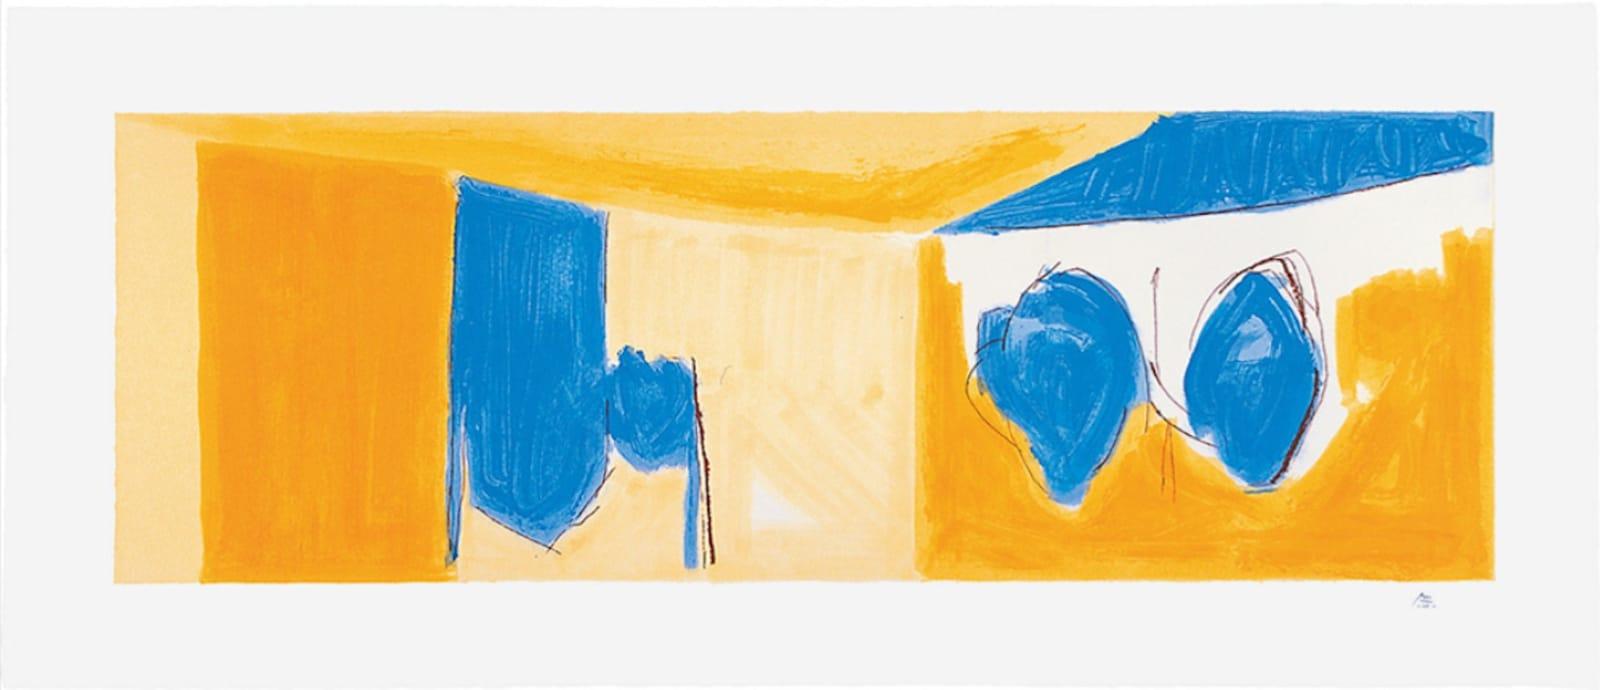 Robert Motherwell, Mediterranean Light, 1991